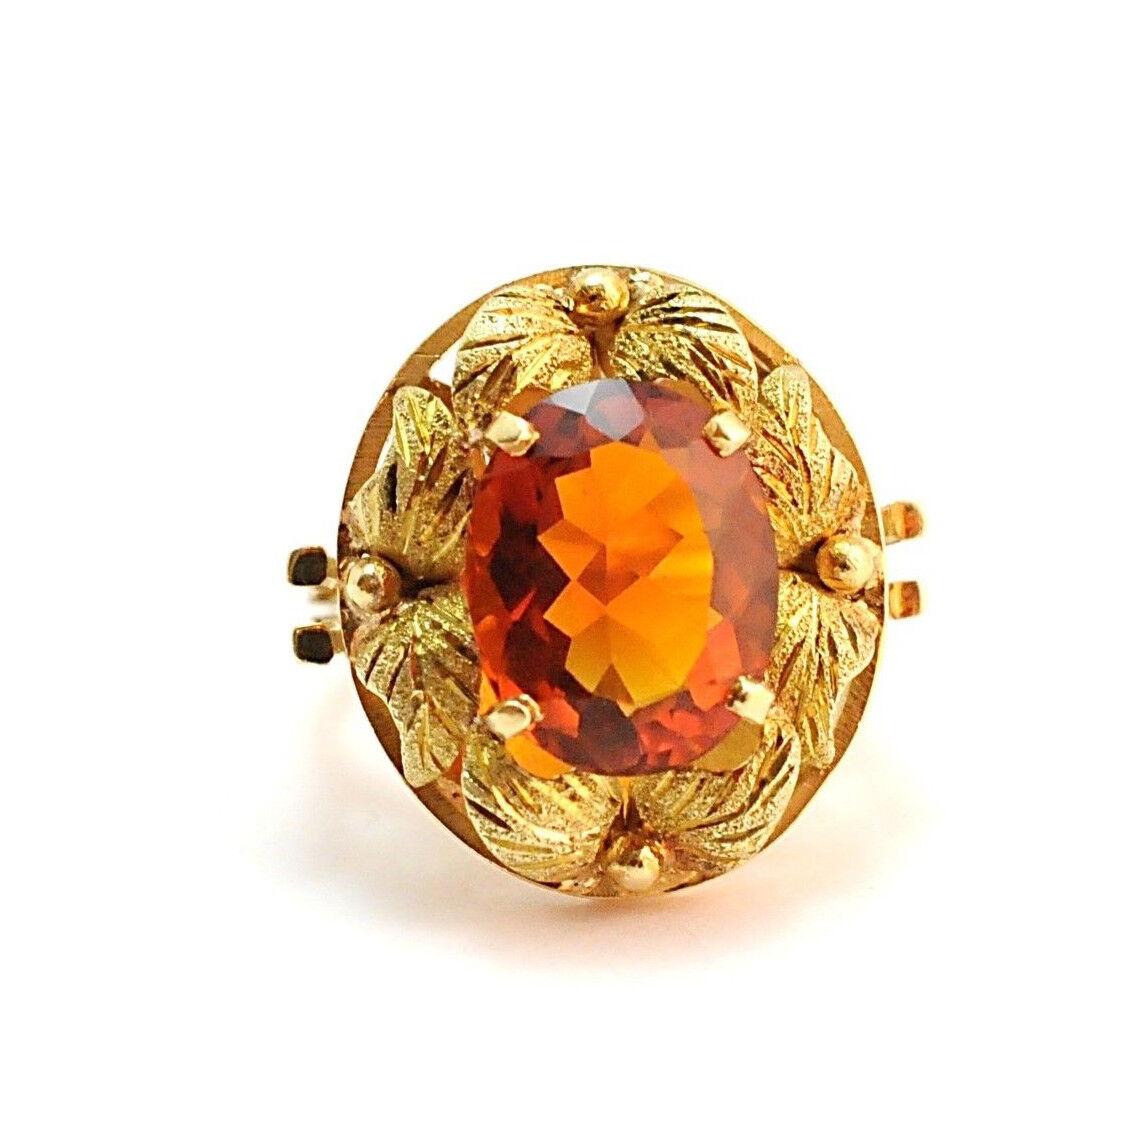 Vintage Madeira Citrine Ring 18k Yellow gold Size 7